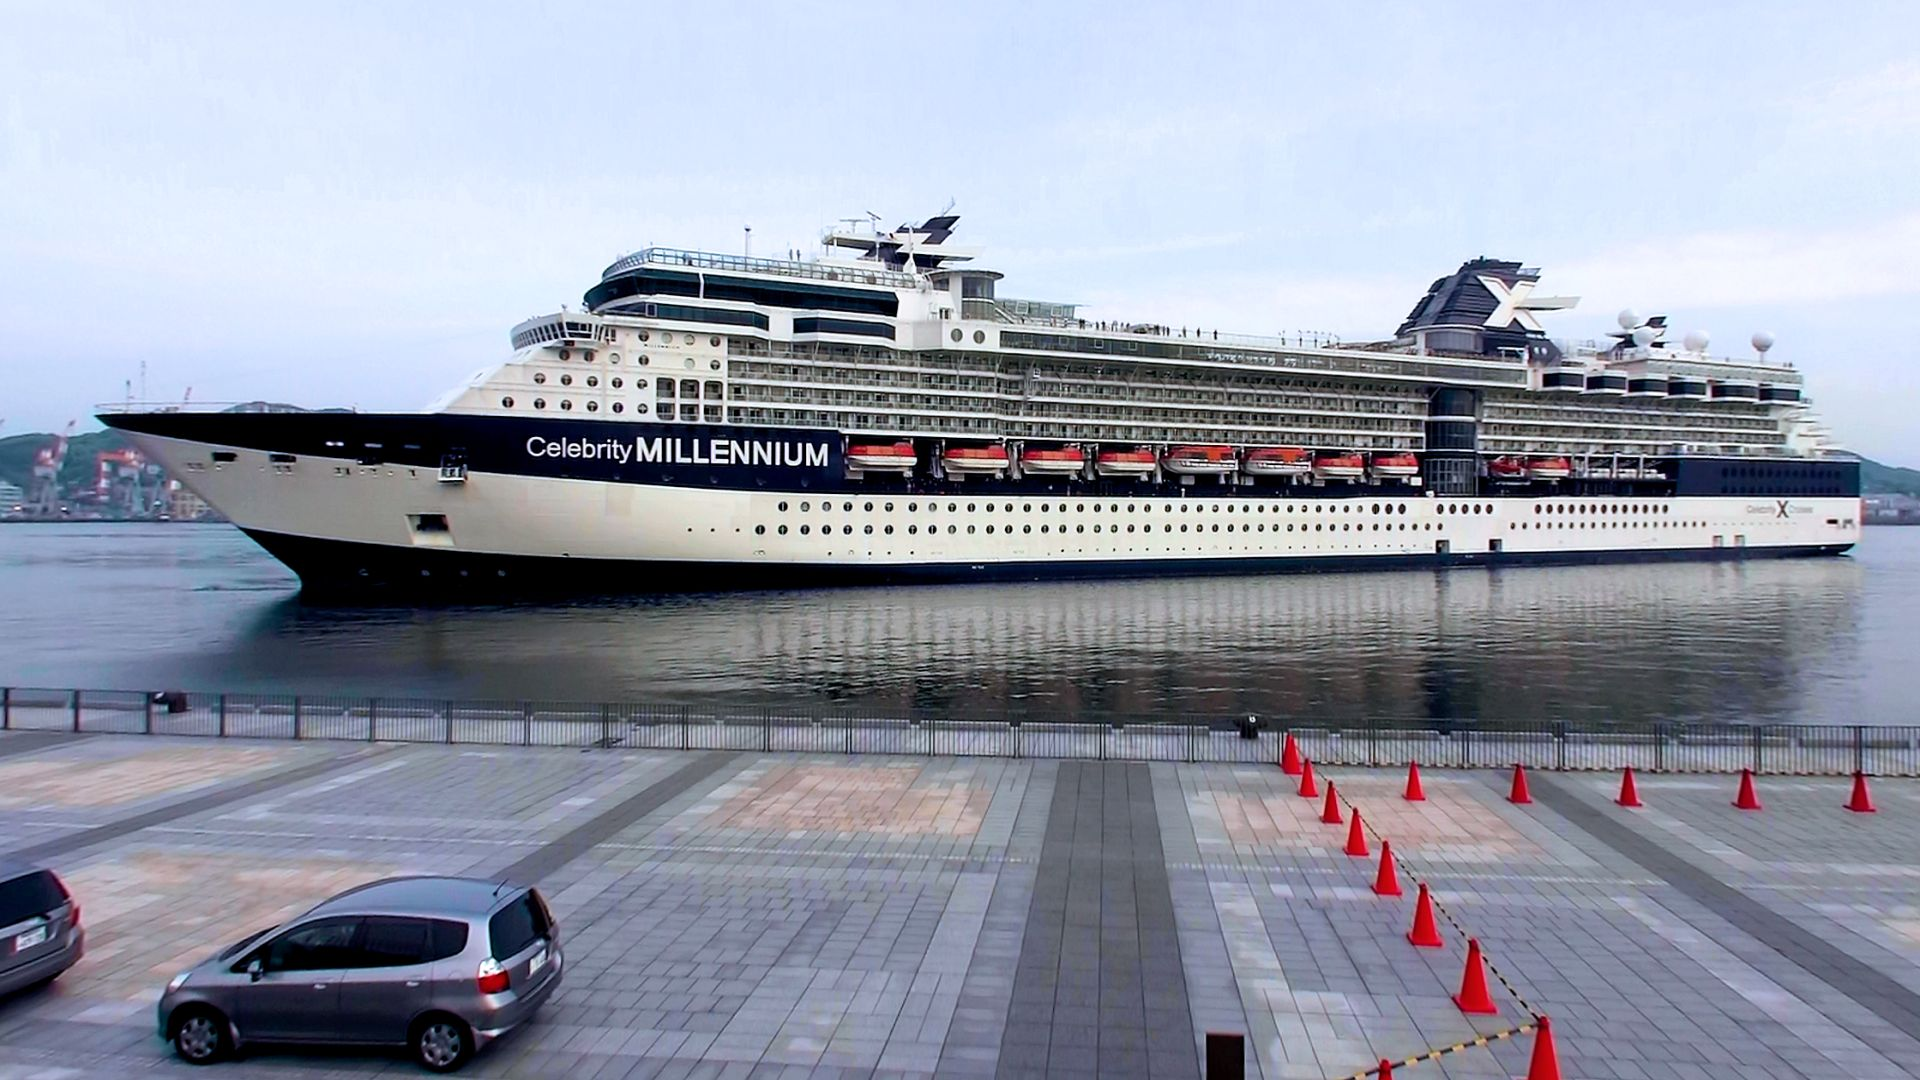 Celebrity Millennium Cruise Ship from Celebrity Cruise Line